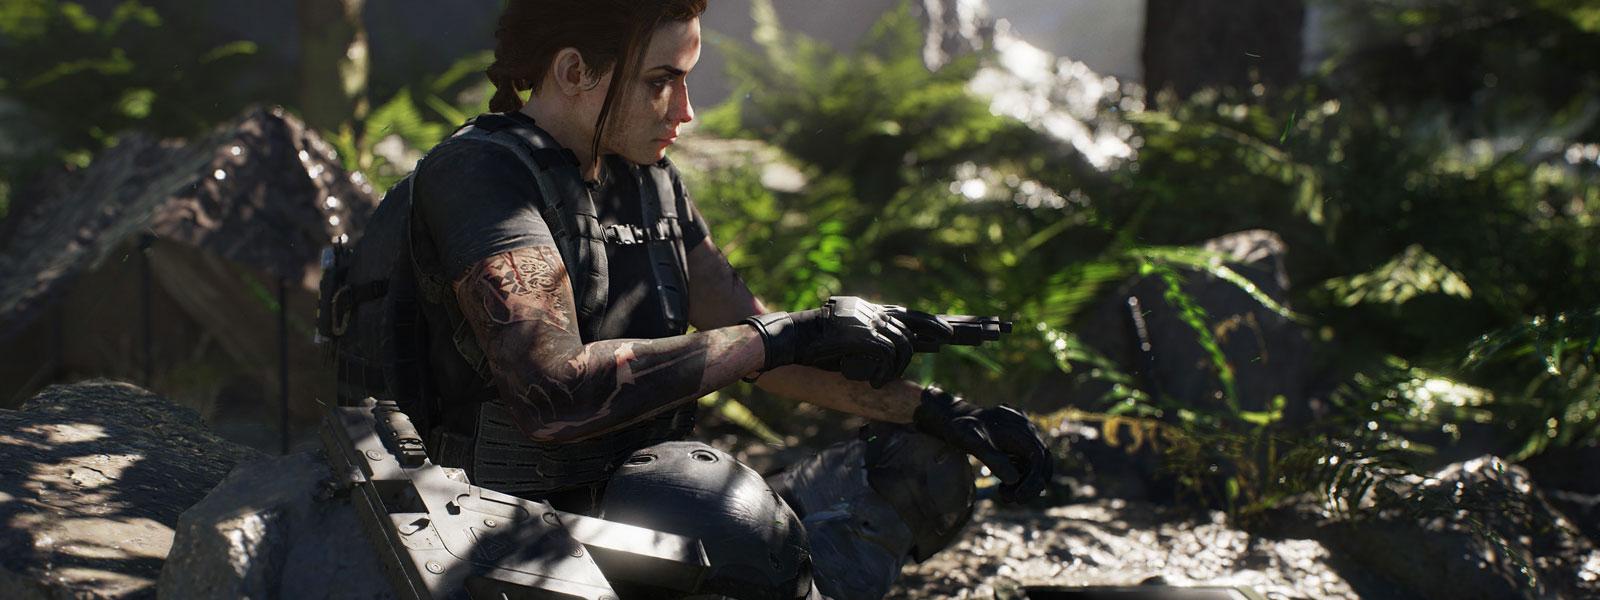 Personaje femenino con una pistola en la mano en la selva